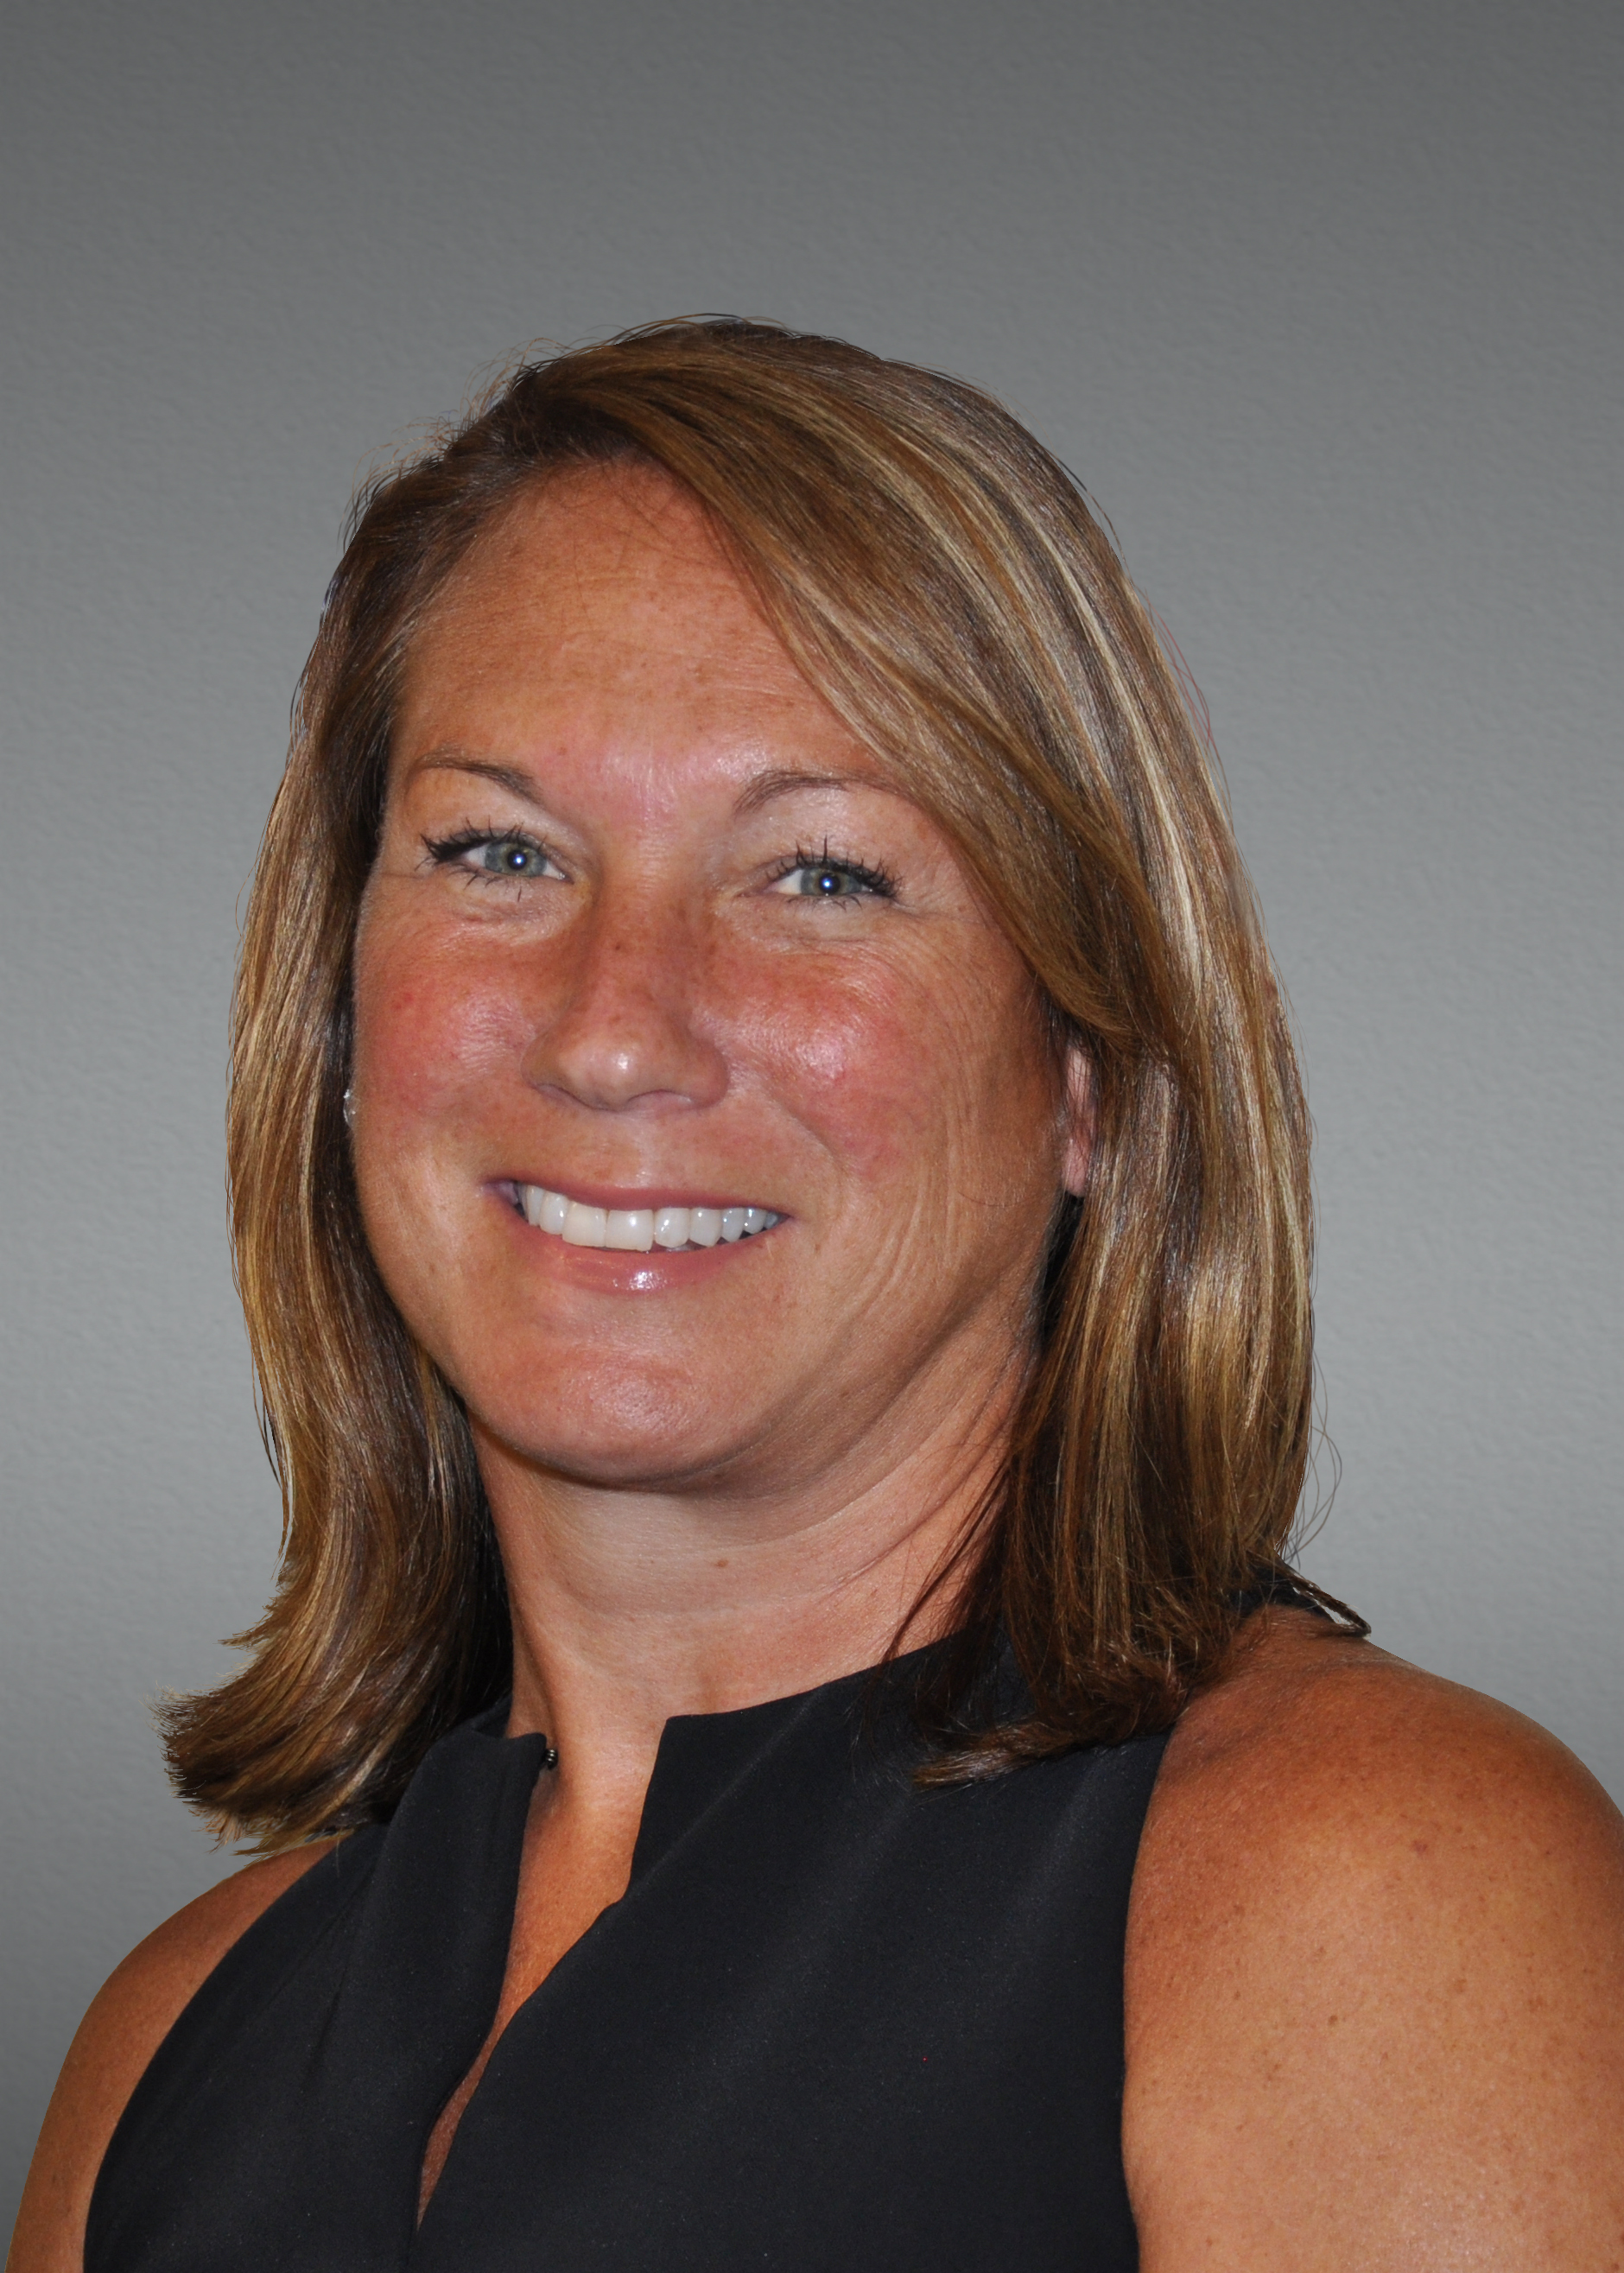 KAR Auction Services Names New Senior Vice President